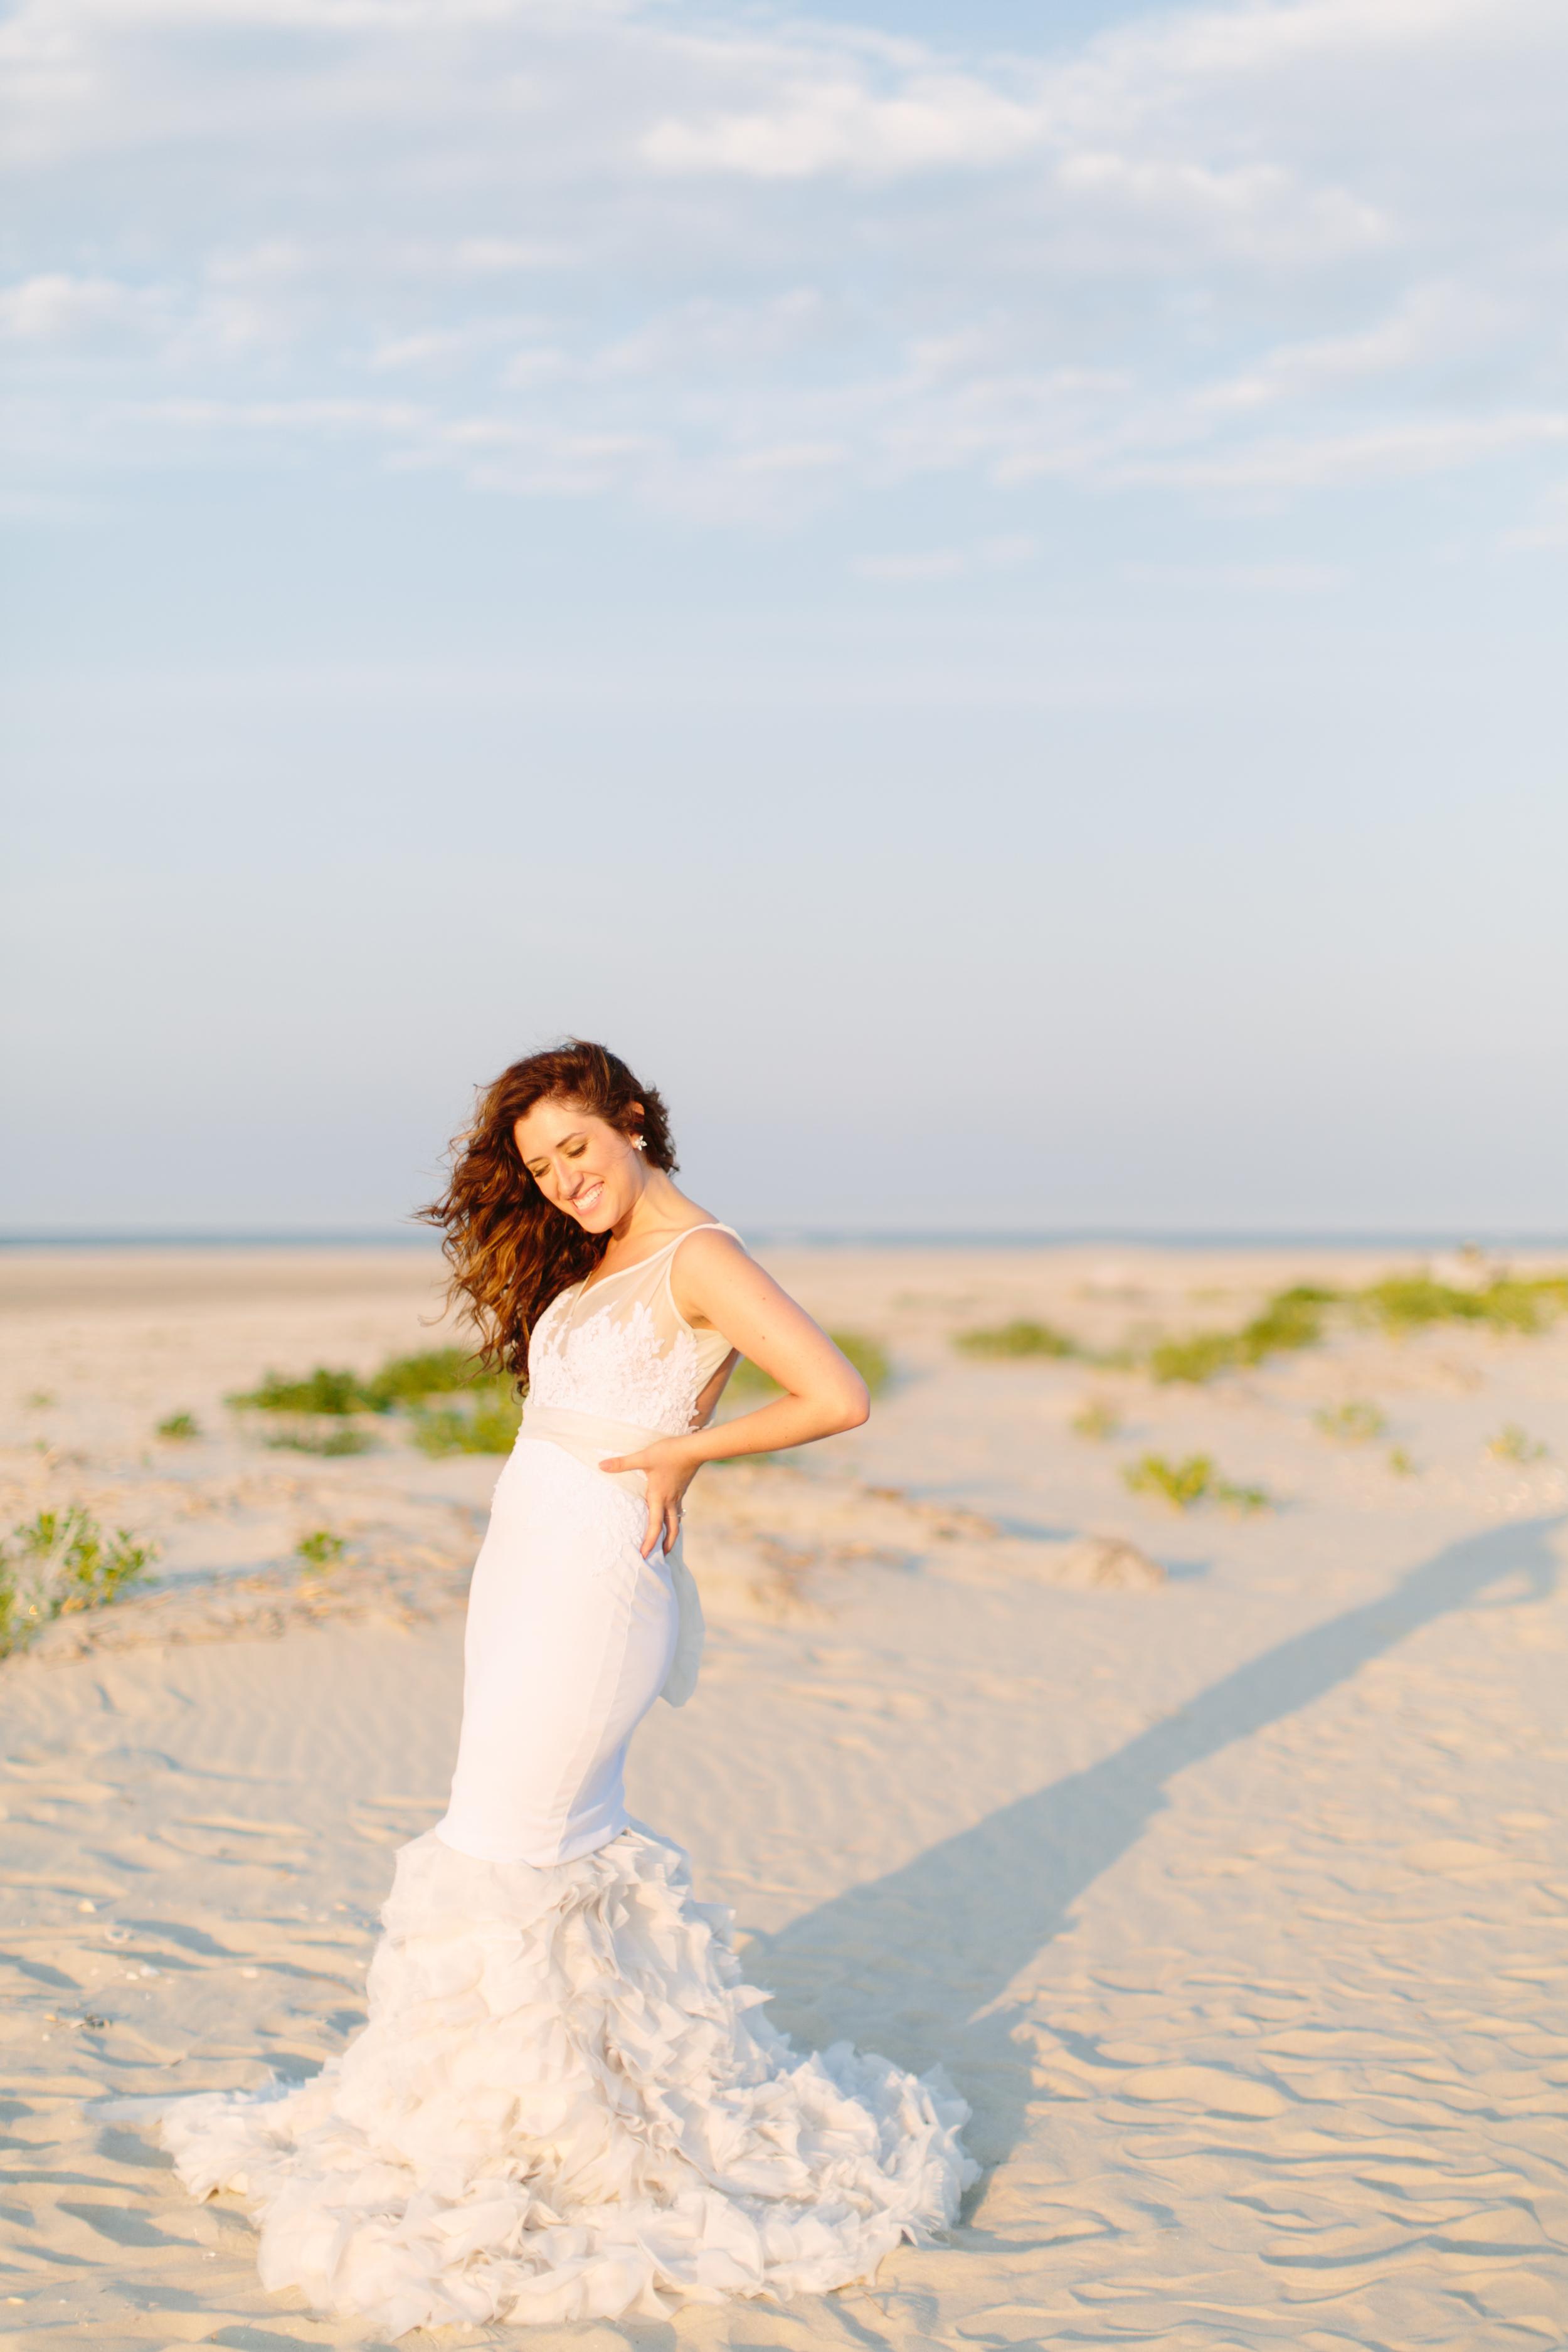 New-Jersey-Wedding-Photographer_Jessica-Cooper-Photography-17.jpg